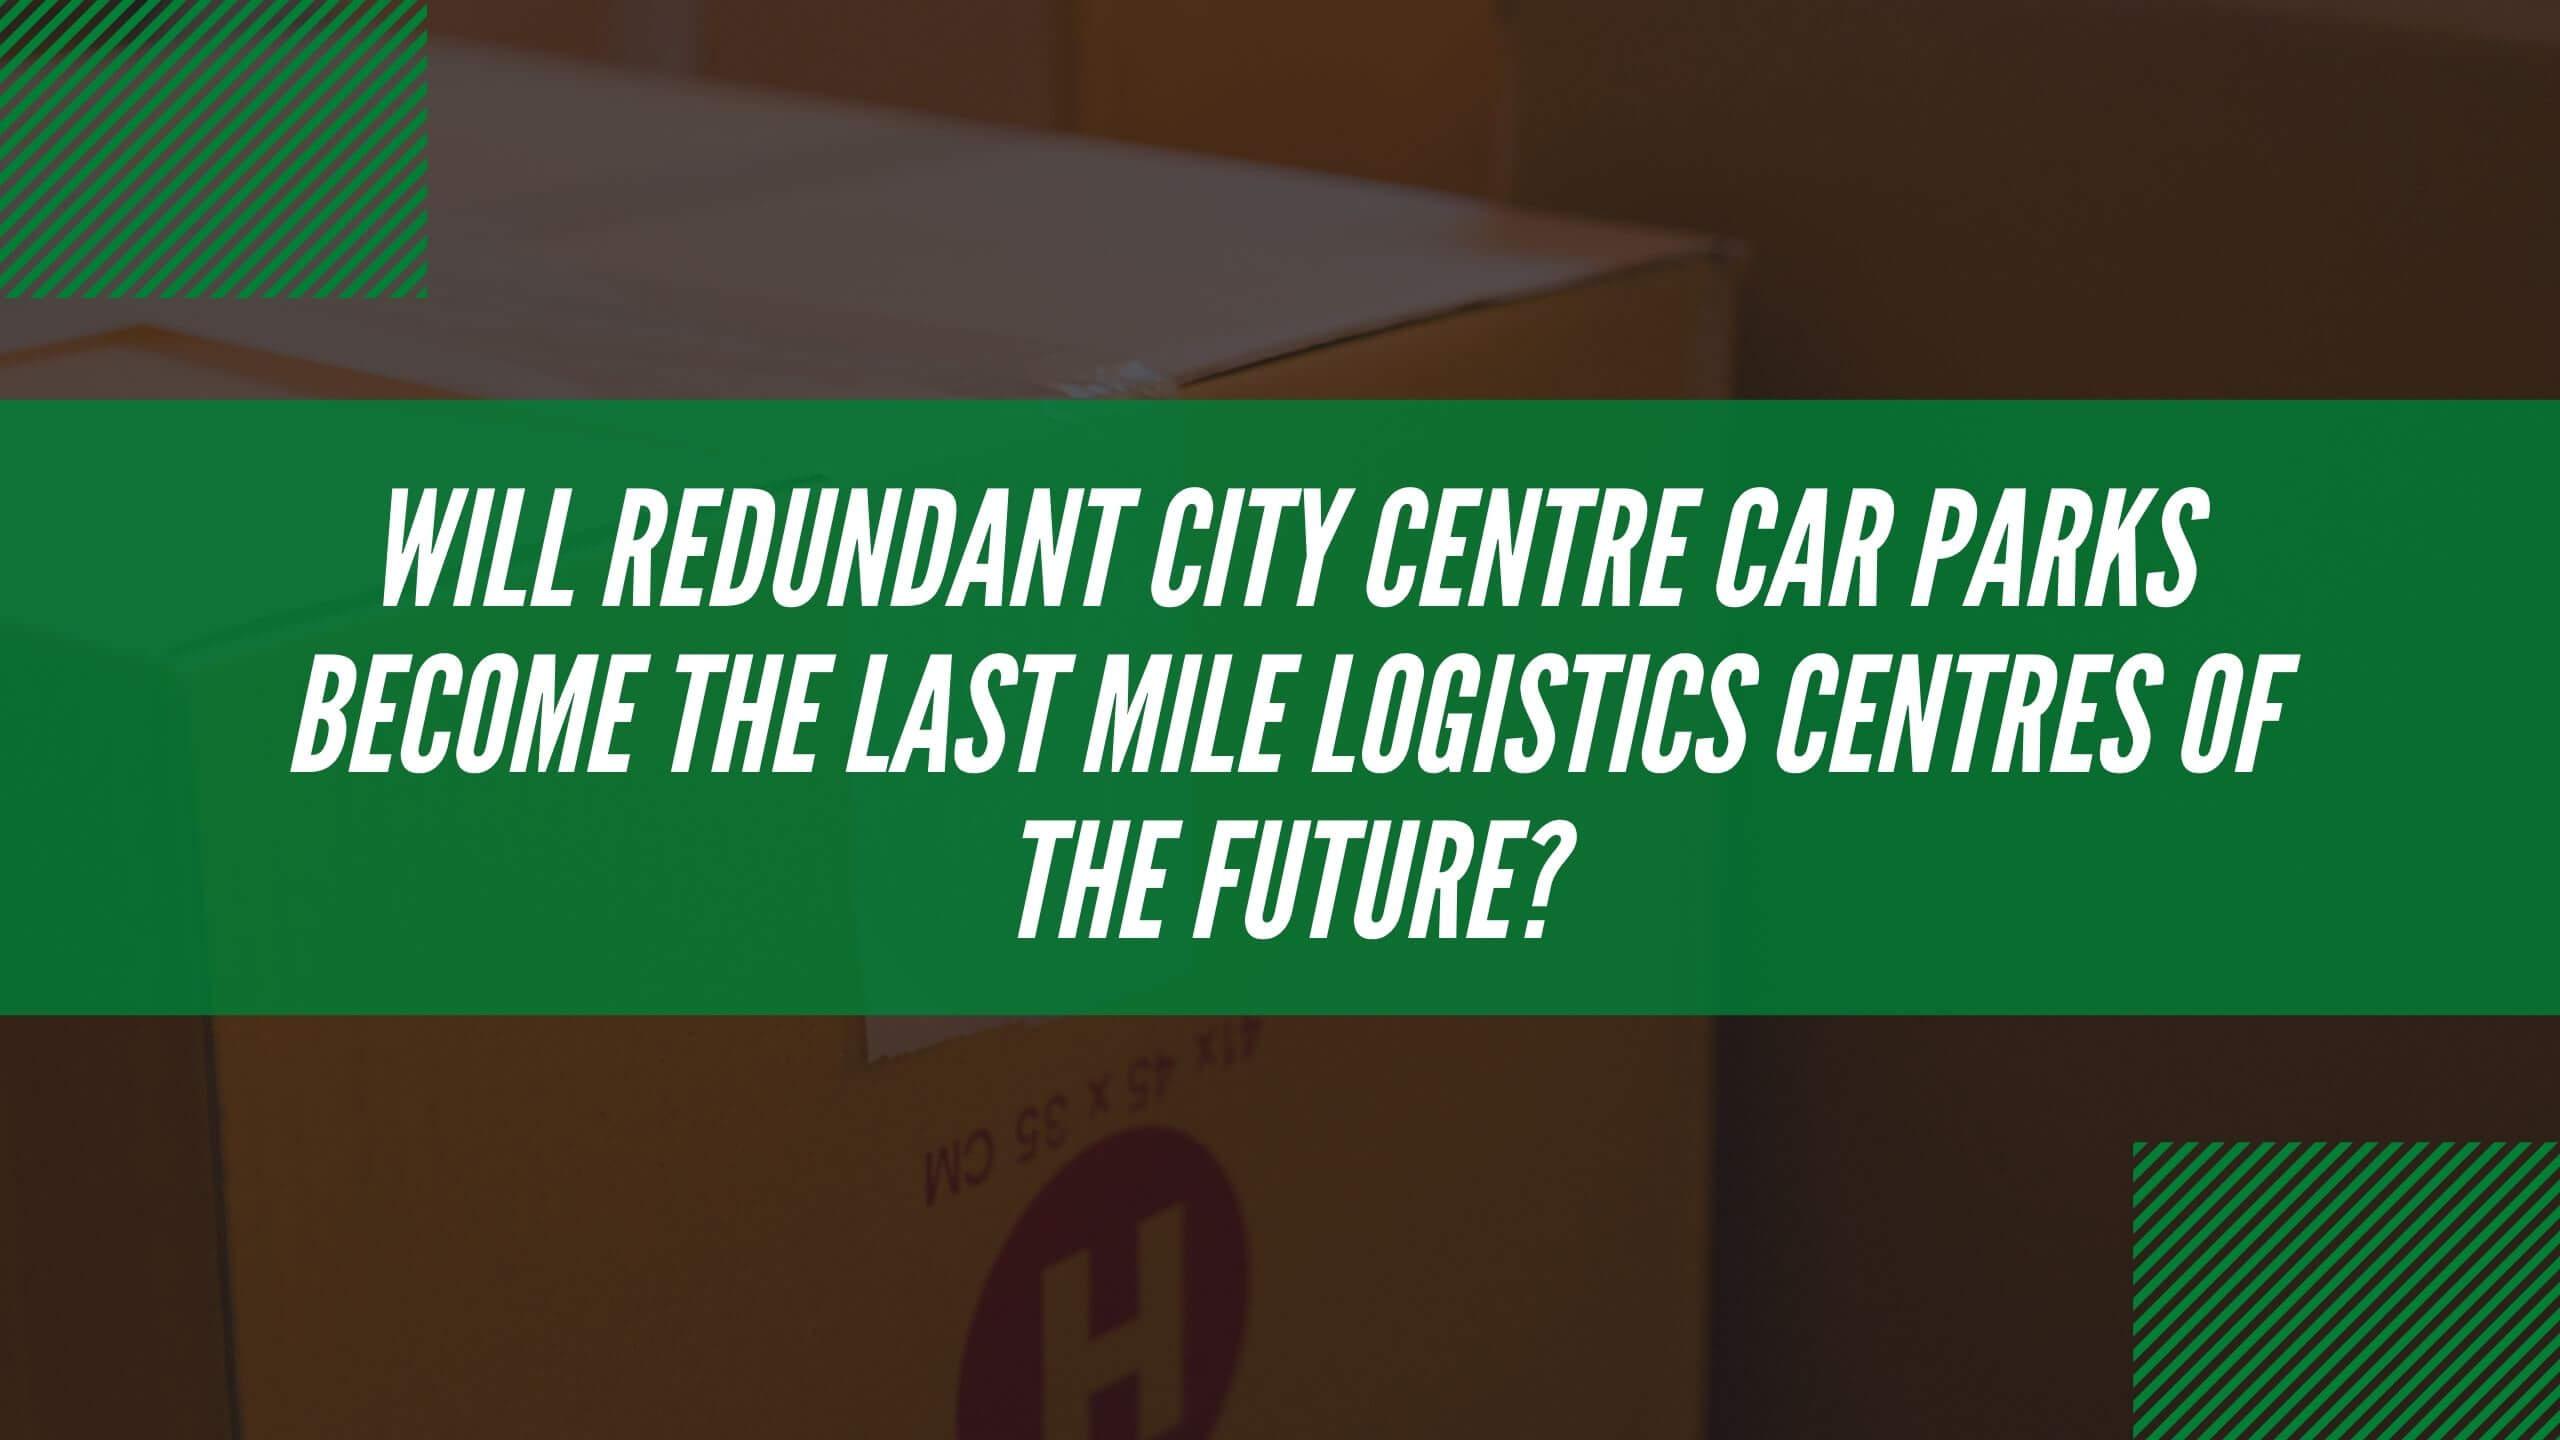 Last Mile Brief Episode 4: Amazon's use of redundant London car parks